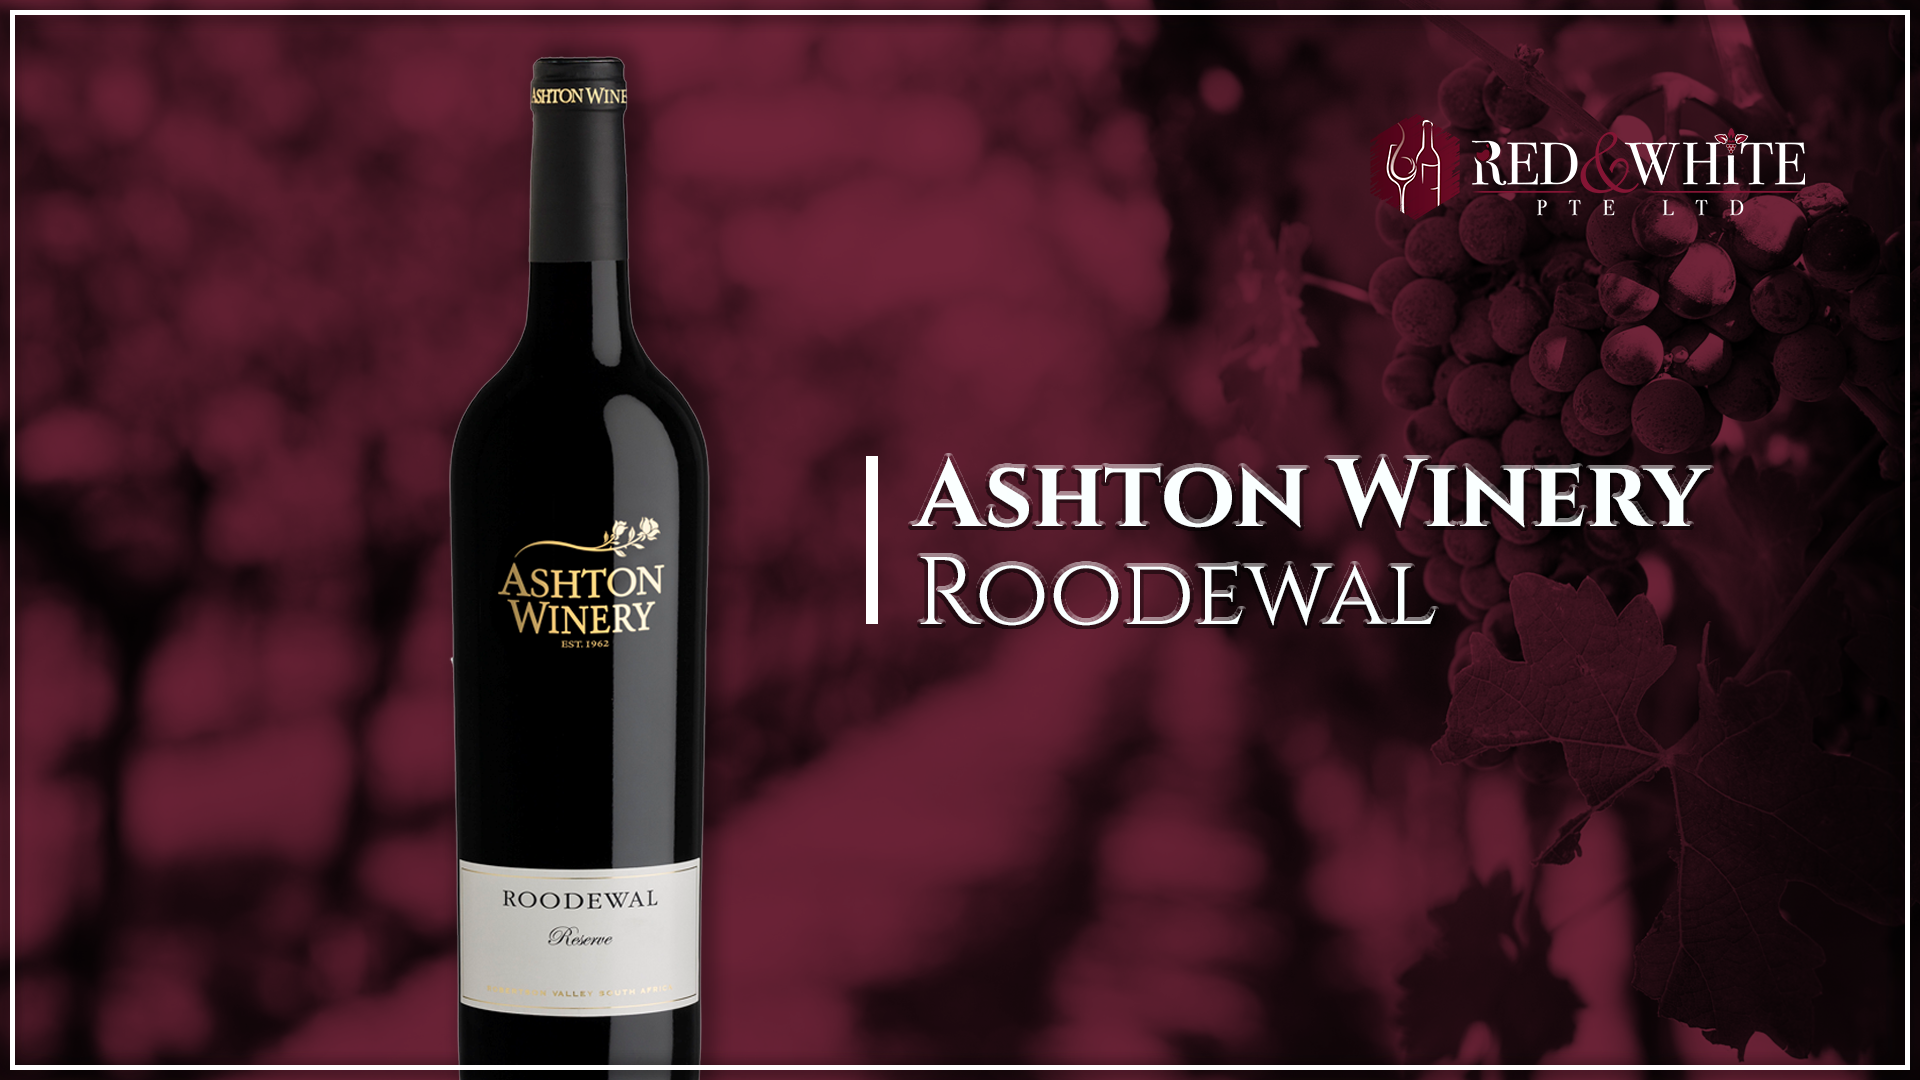 Ashton Winery Roodewal